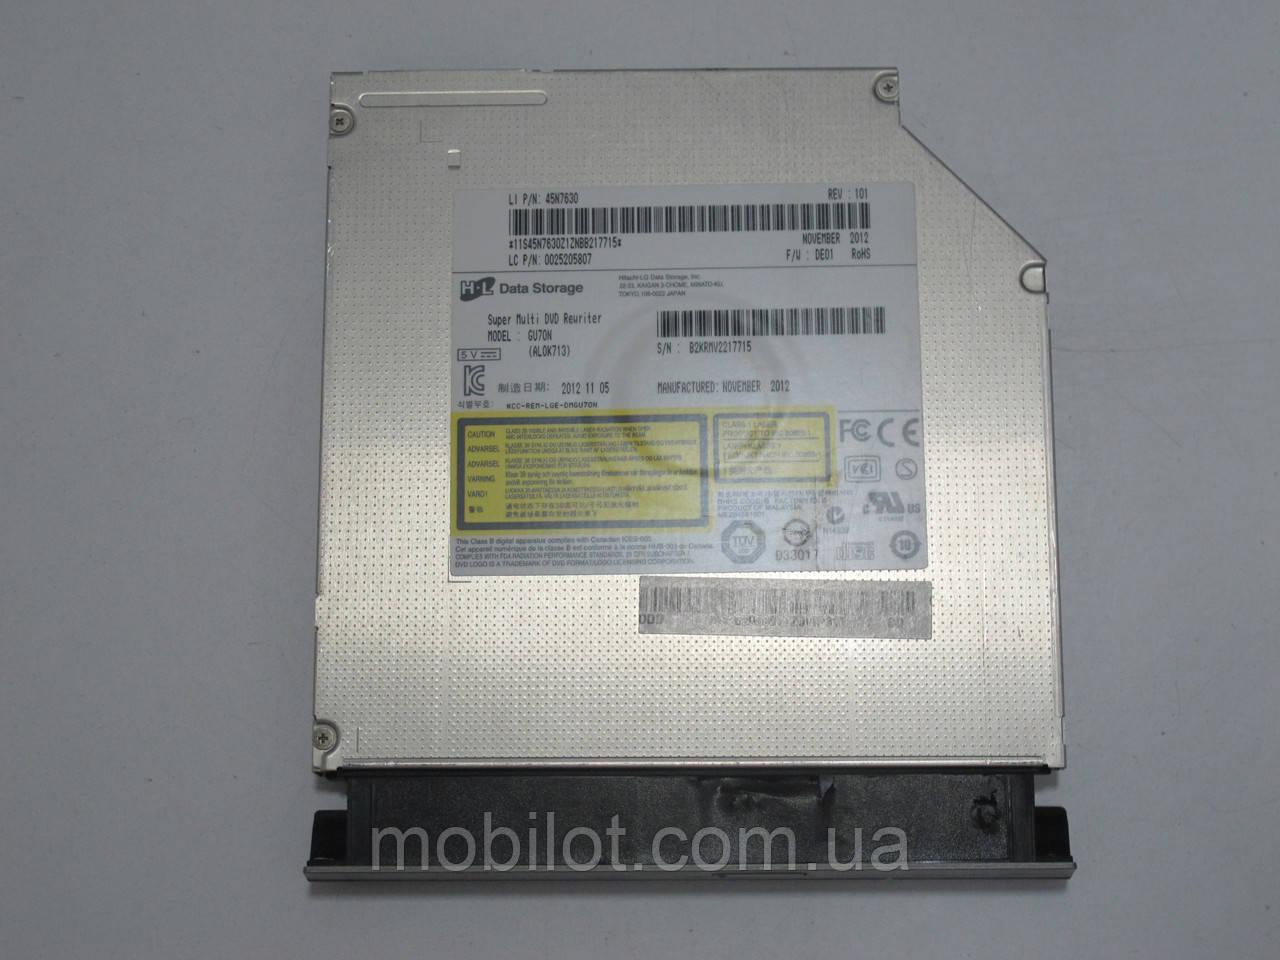 Оптический привод Lenovo Z500 (NZ-6684)